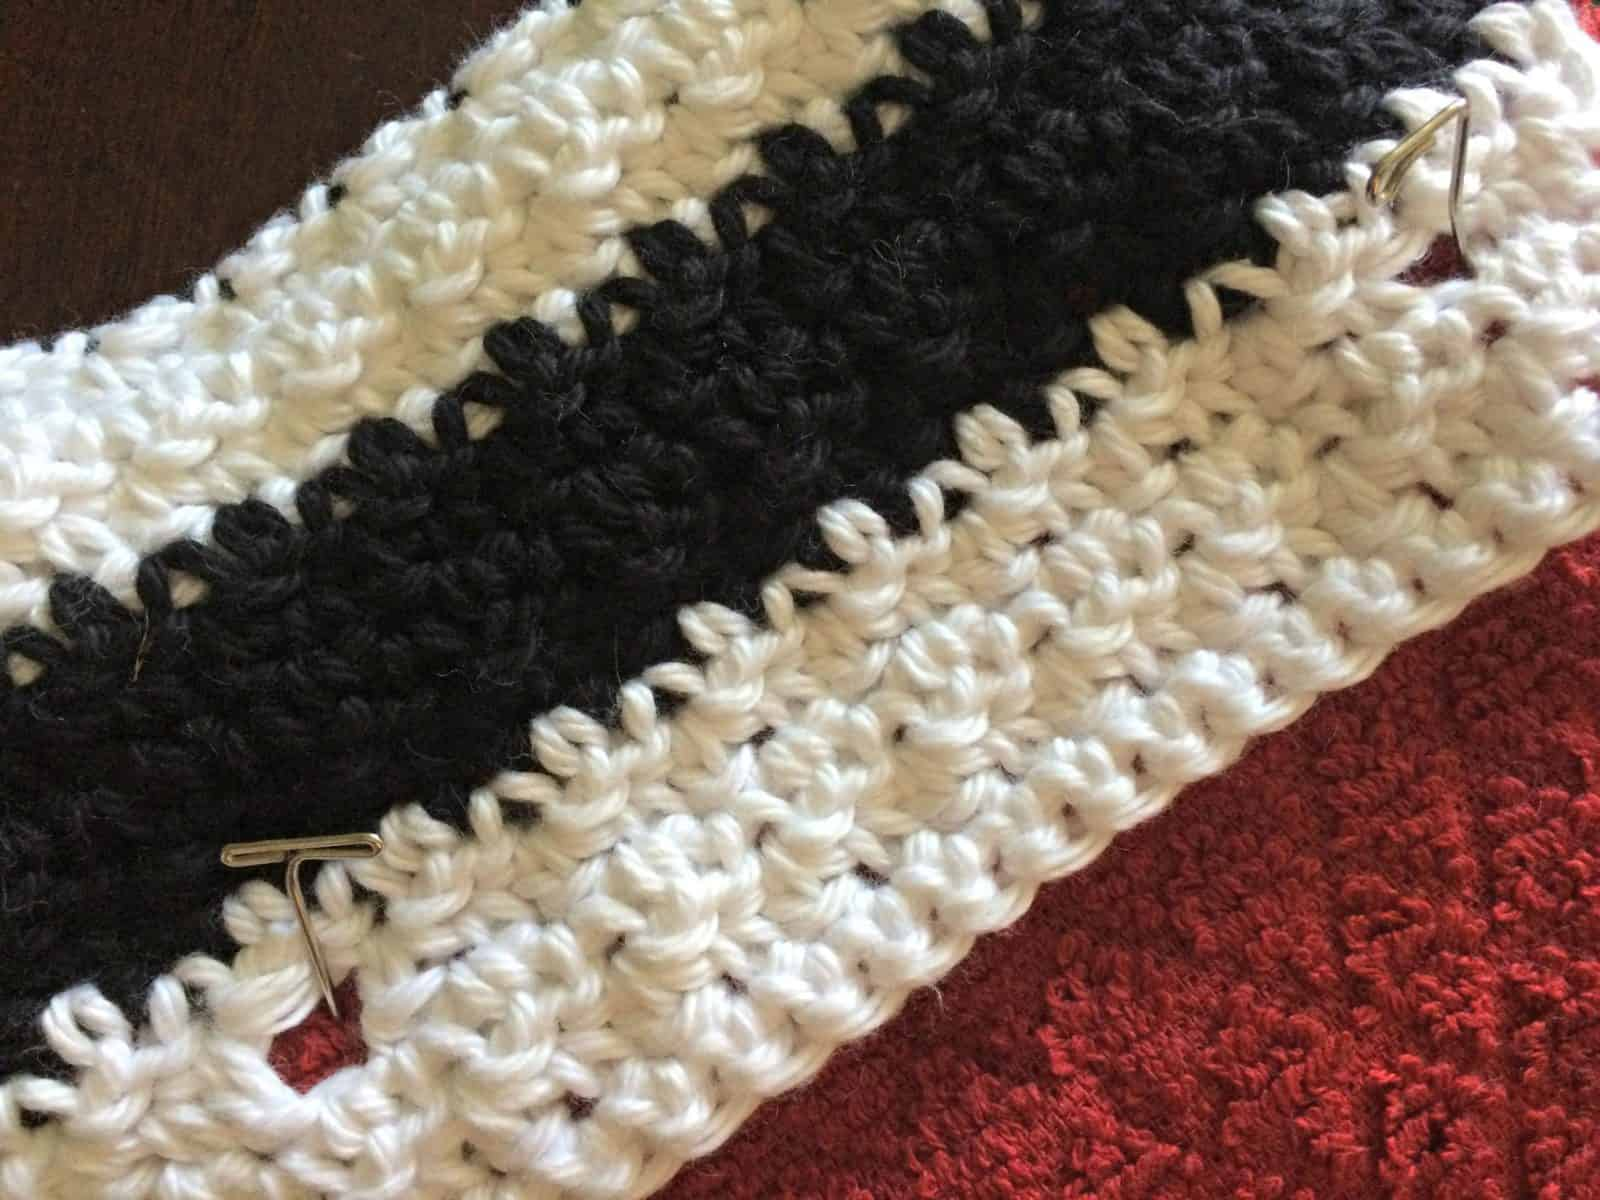 Pin in place crochet towel topper.